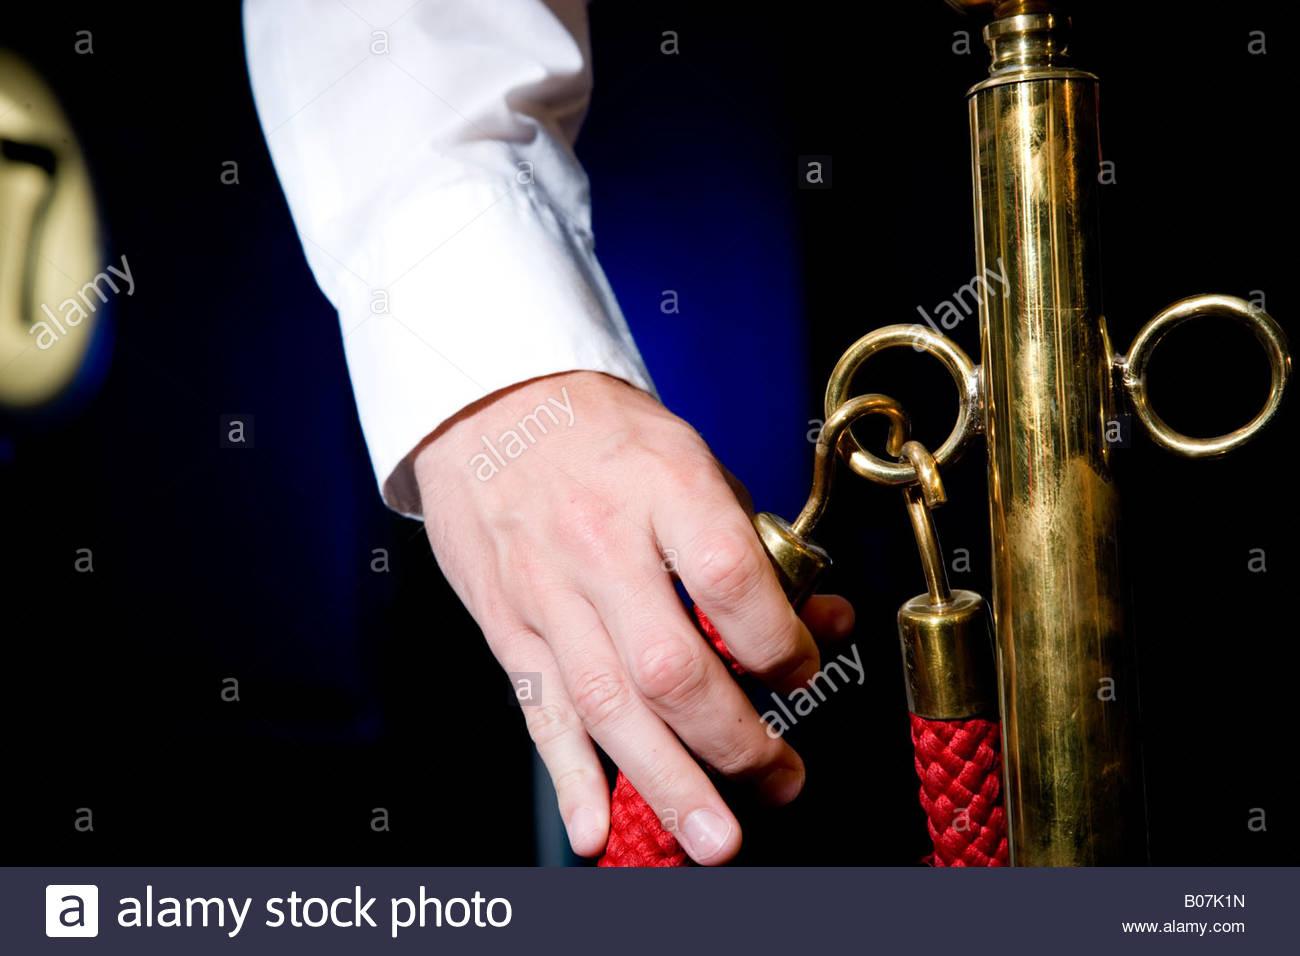 Cinema usher's hand holding red cordon - Stock Image